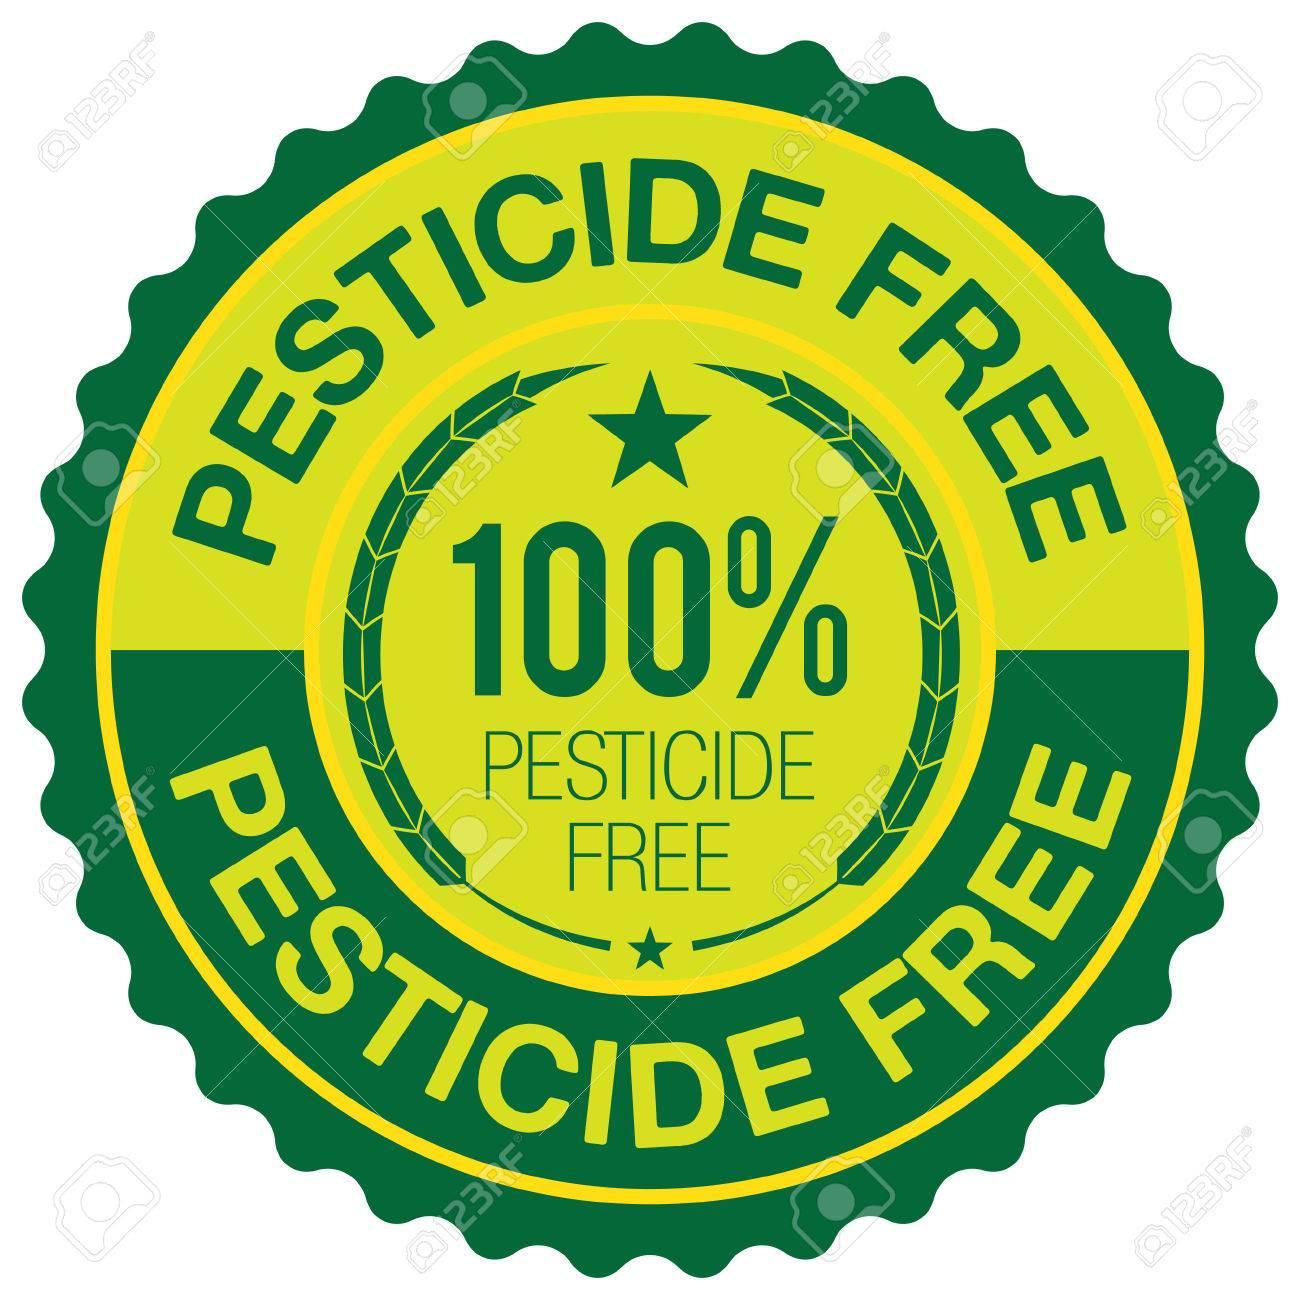 Pesticide Free